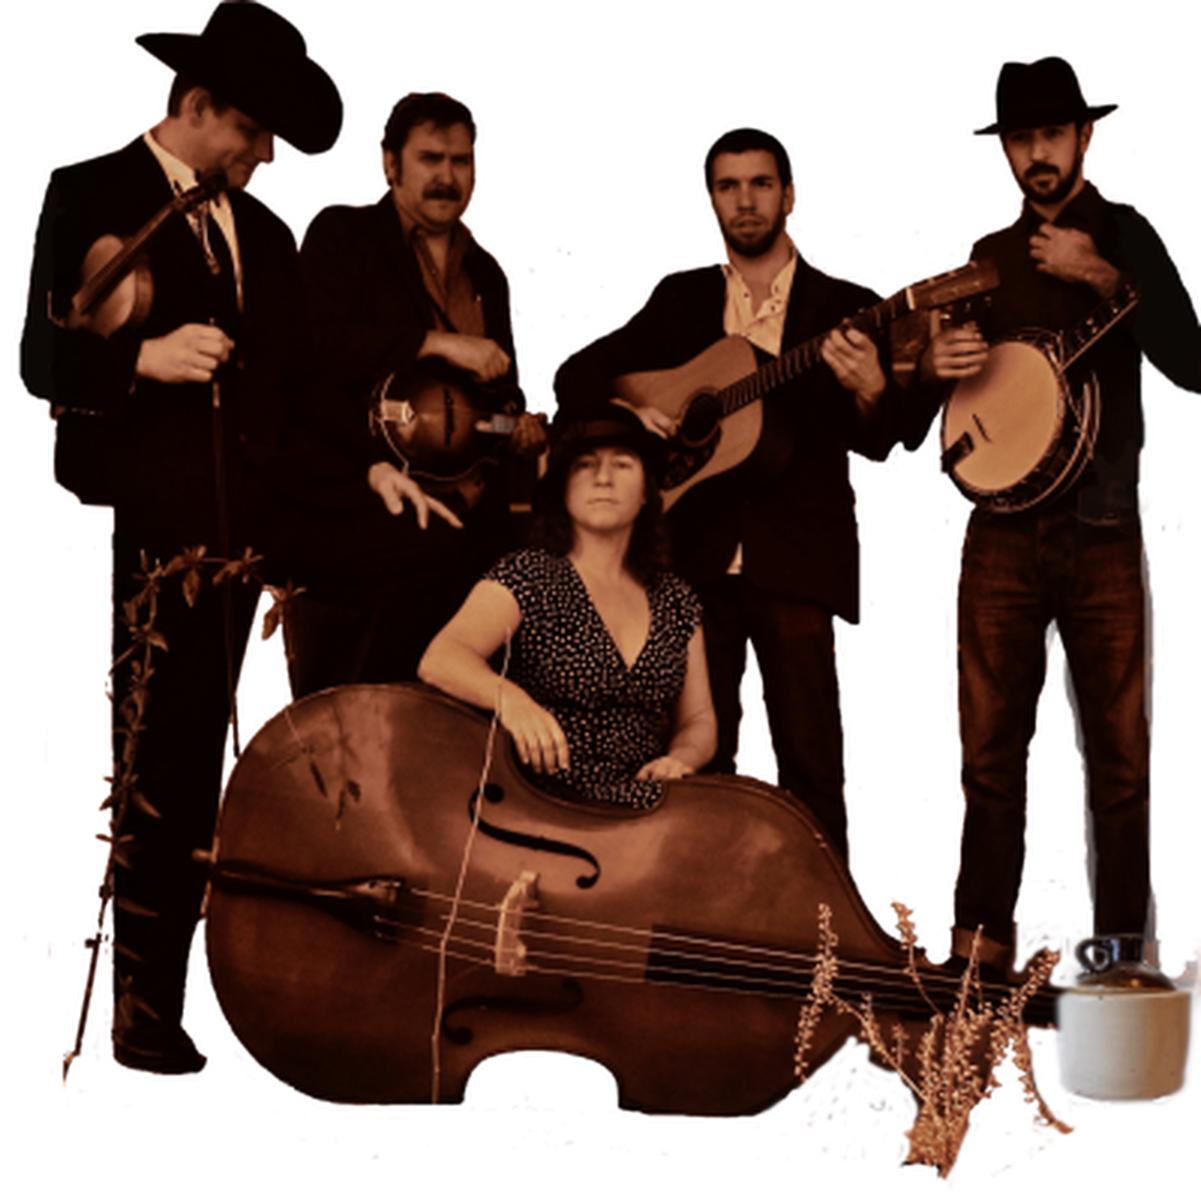 Johnny Campbell & The Bluegrass Drifters